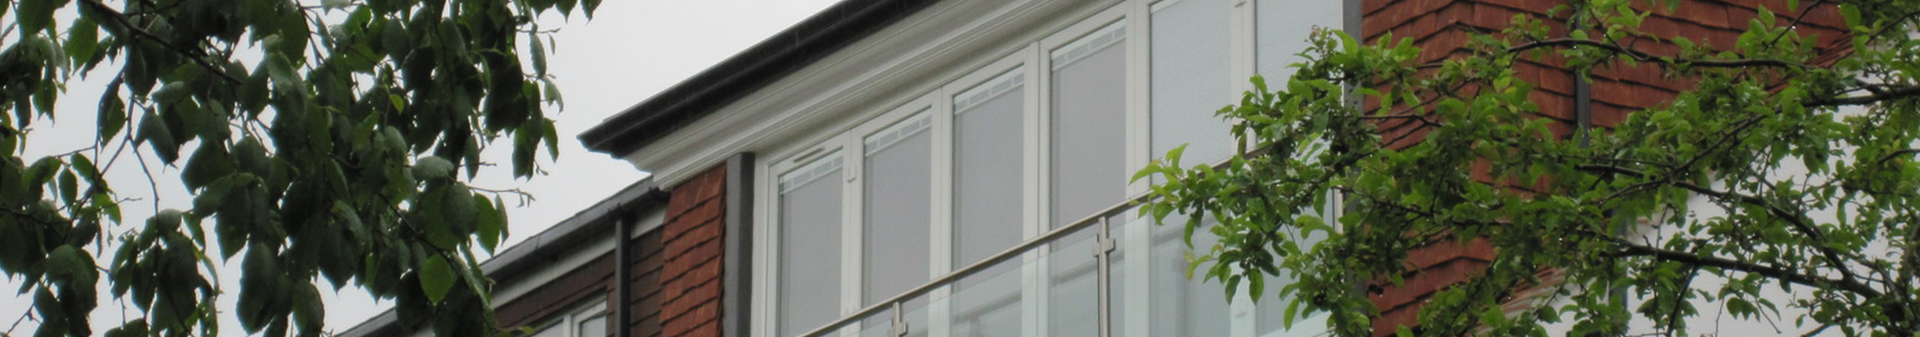 Loft Conversions Chingford